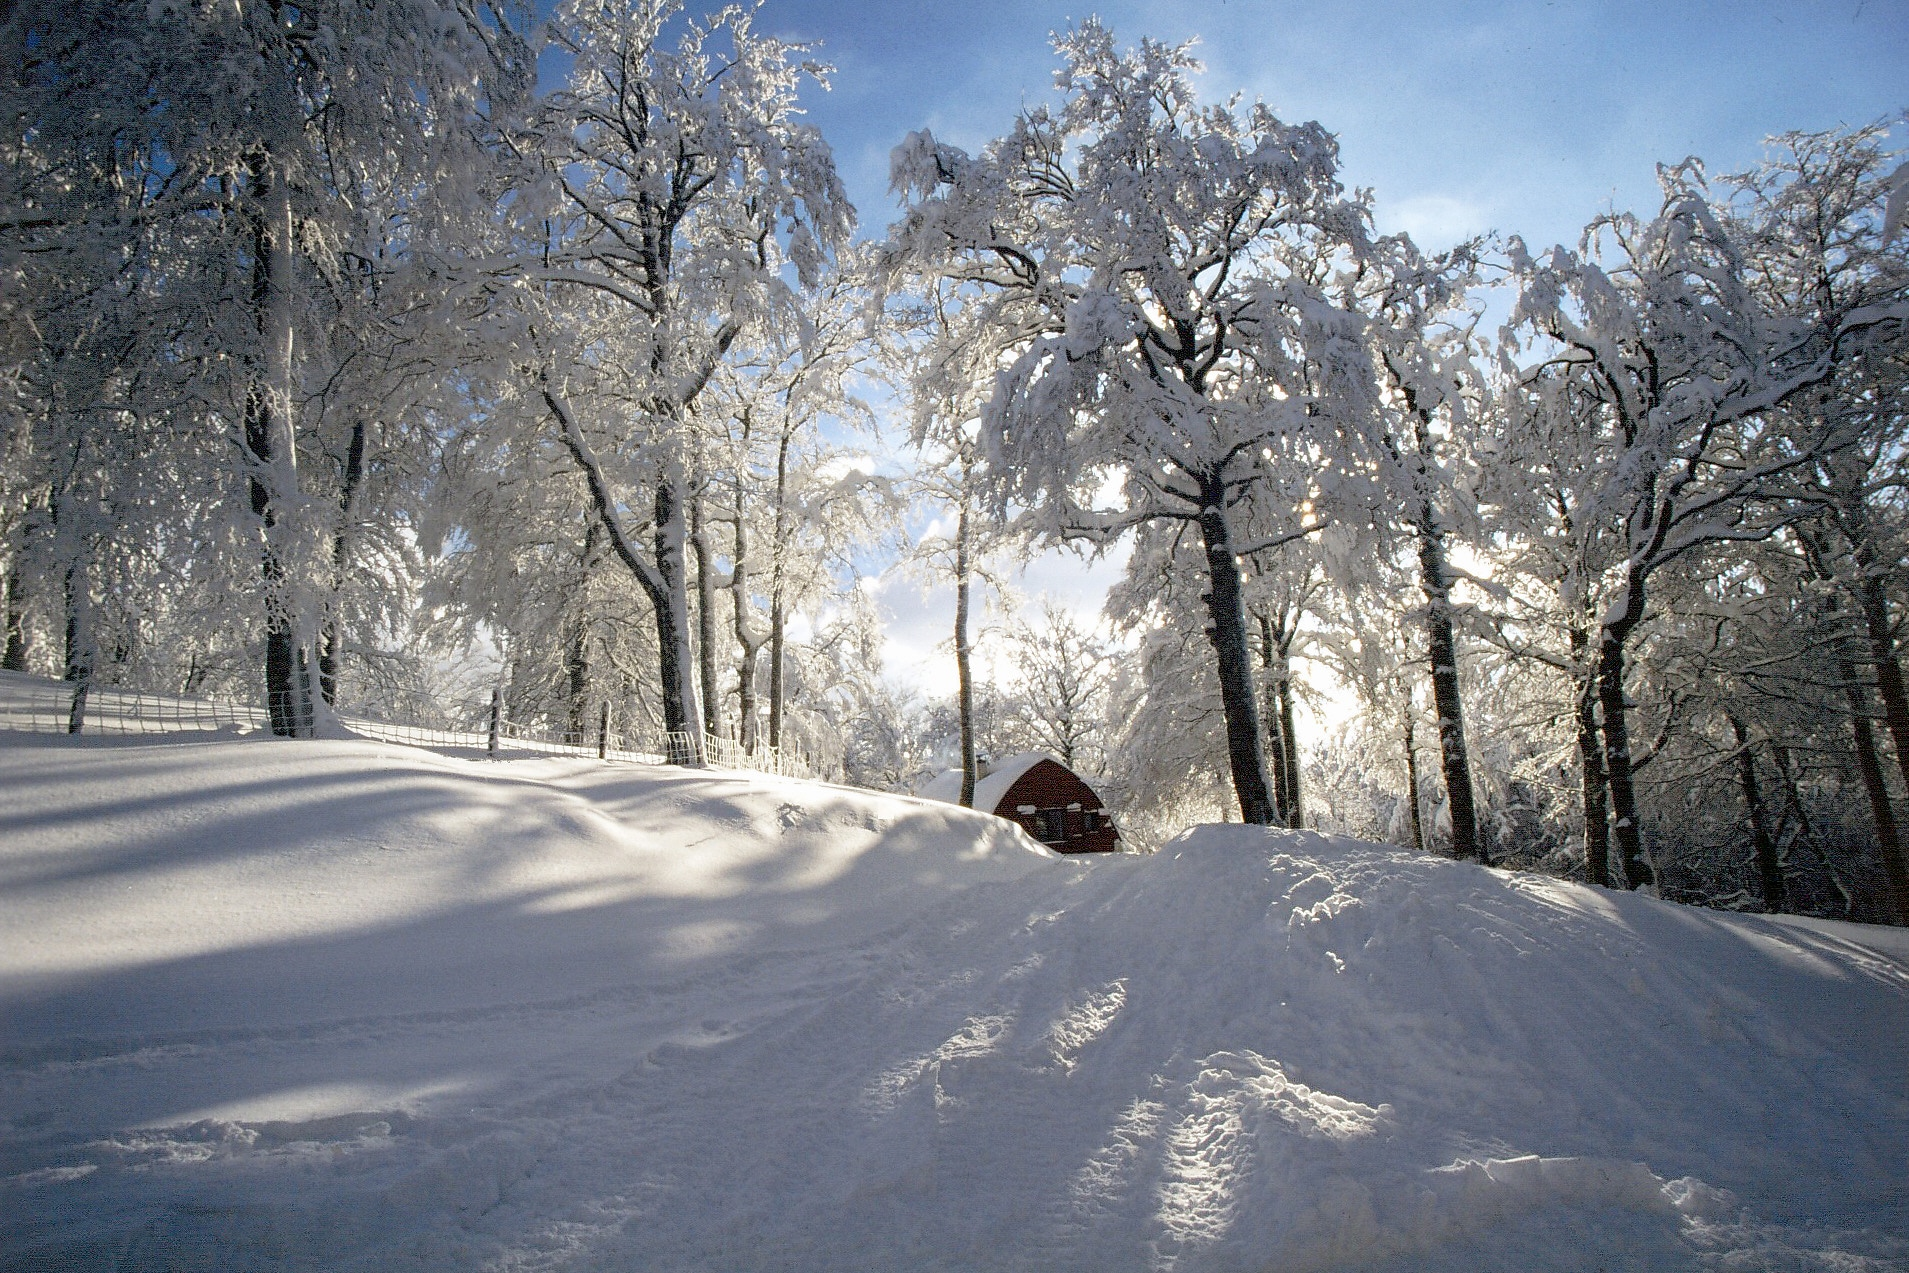 sejour-slowtourisme-paysbasque-chalet-Iraty-neige ©Chalets d_Iraty